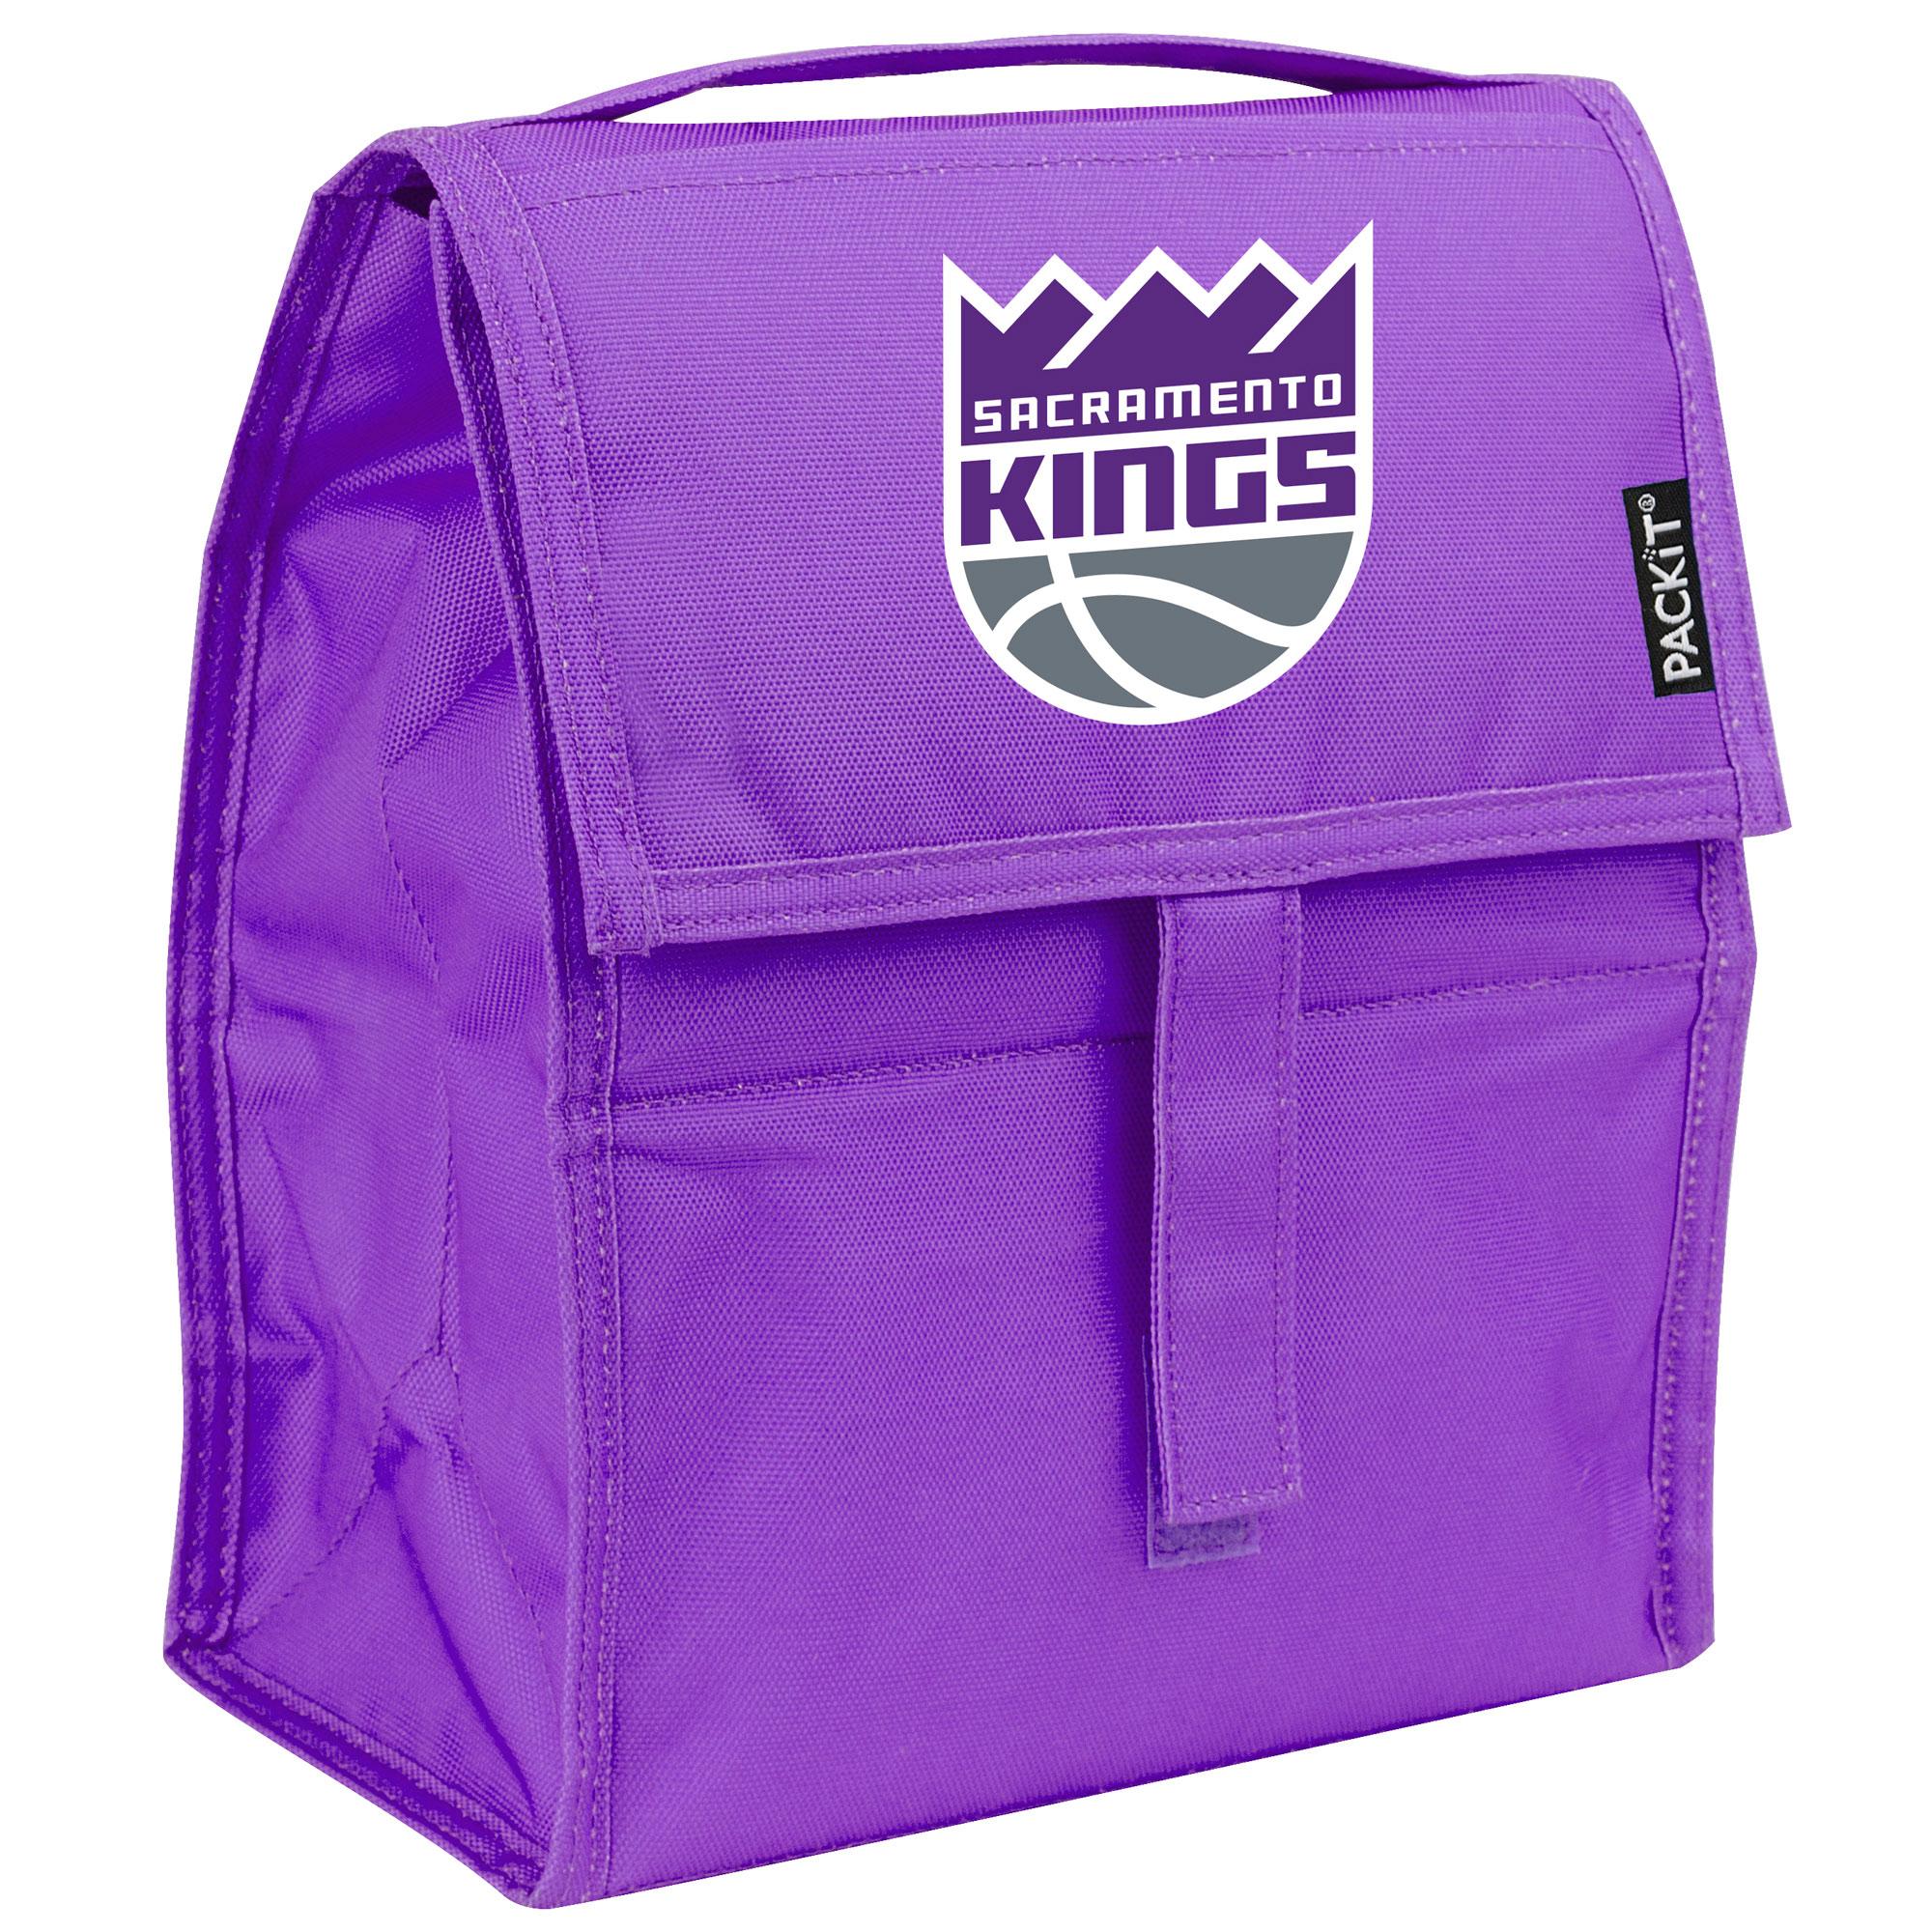 Sacramento Kings PackIt Lunch Box